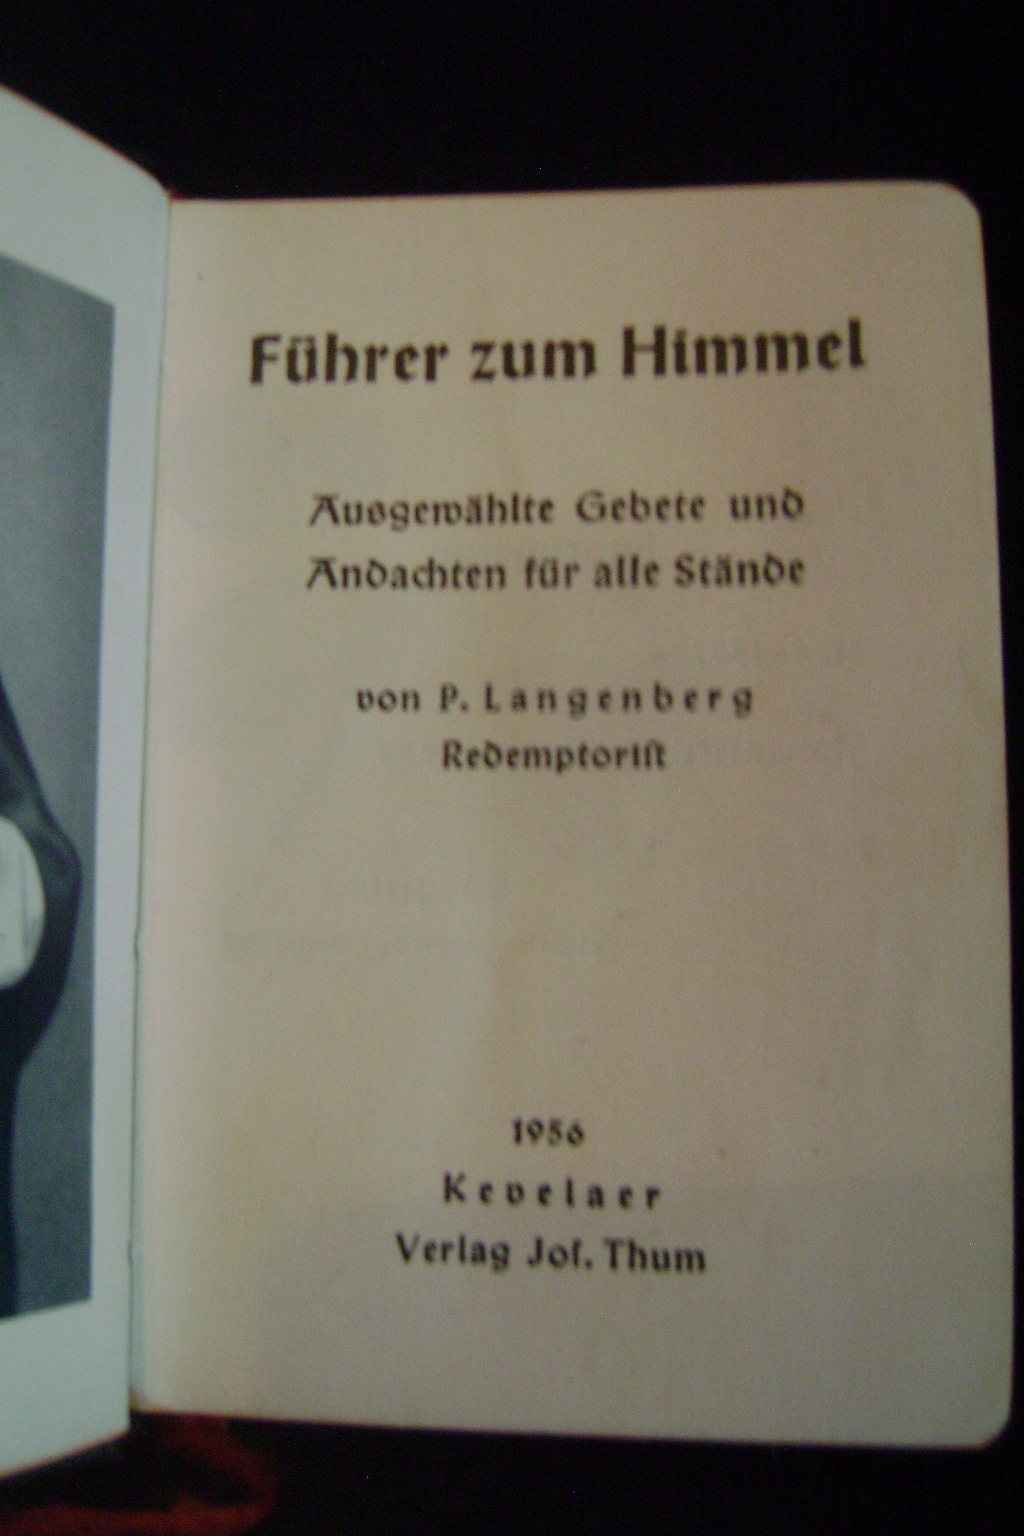 Knjiga_religija_Fuhrer_zum_himmel_1956__2.JPG